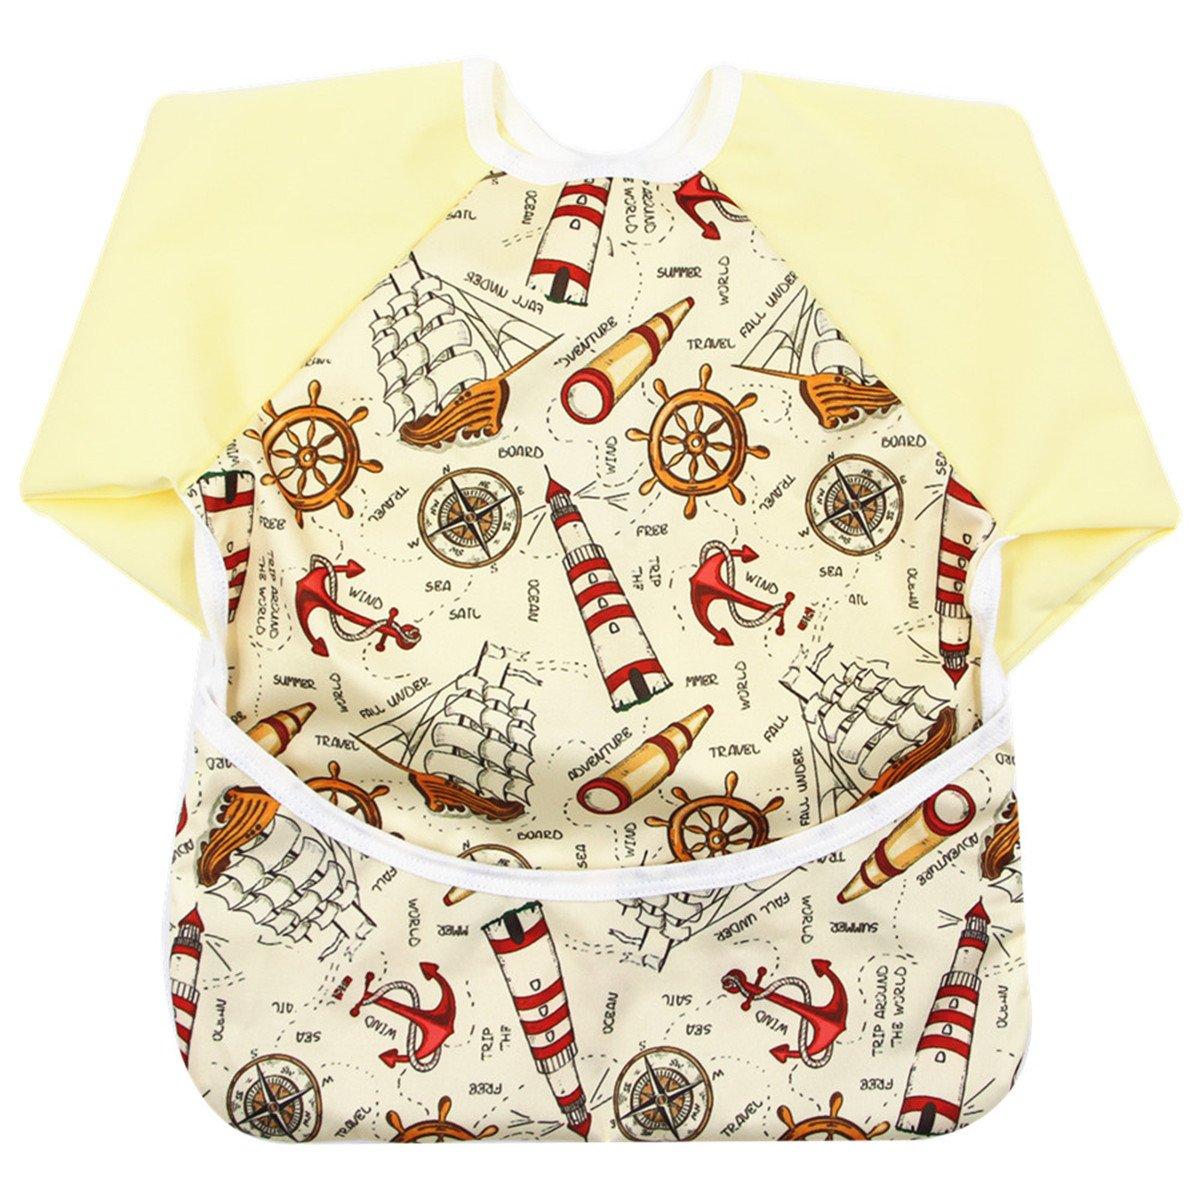 Storeofbaby Baby Bibs with Sleeves Pocket Long Waterproof Aprons 6 to 24 Months Unisex Sleeved Bib_1